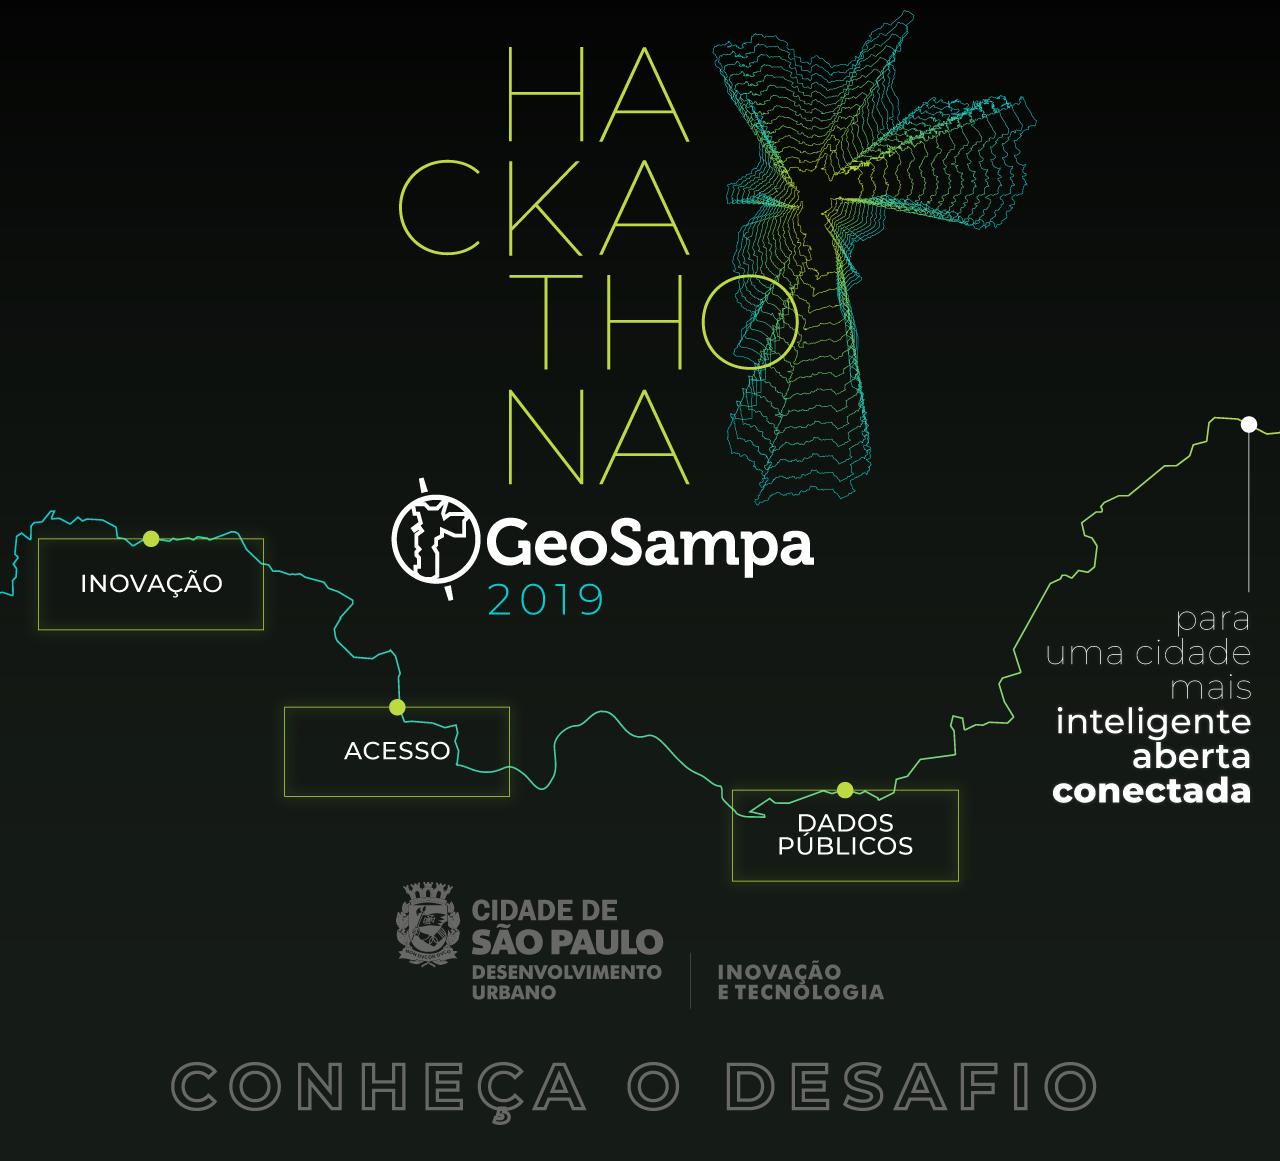 geosampa-header